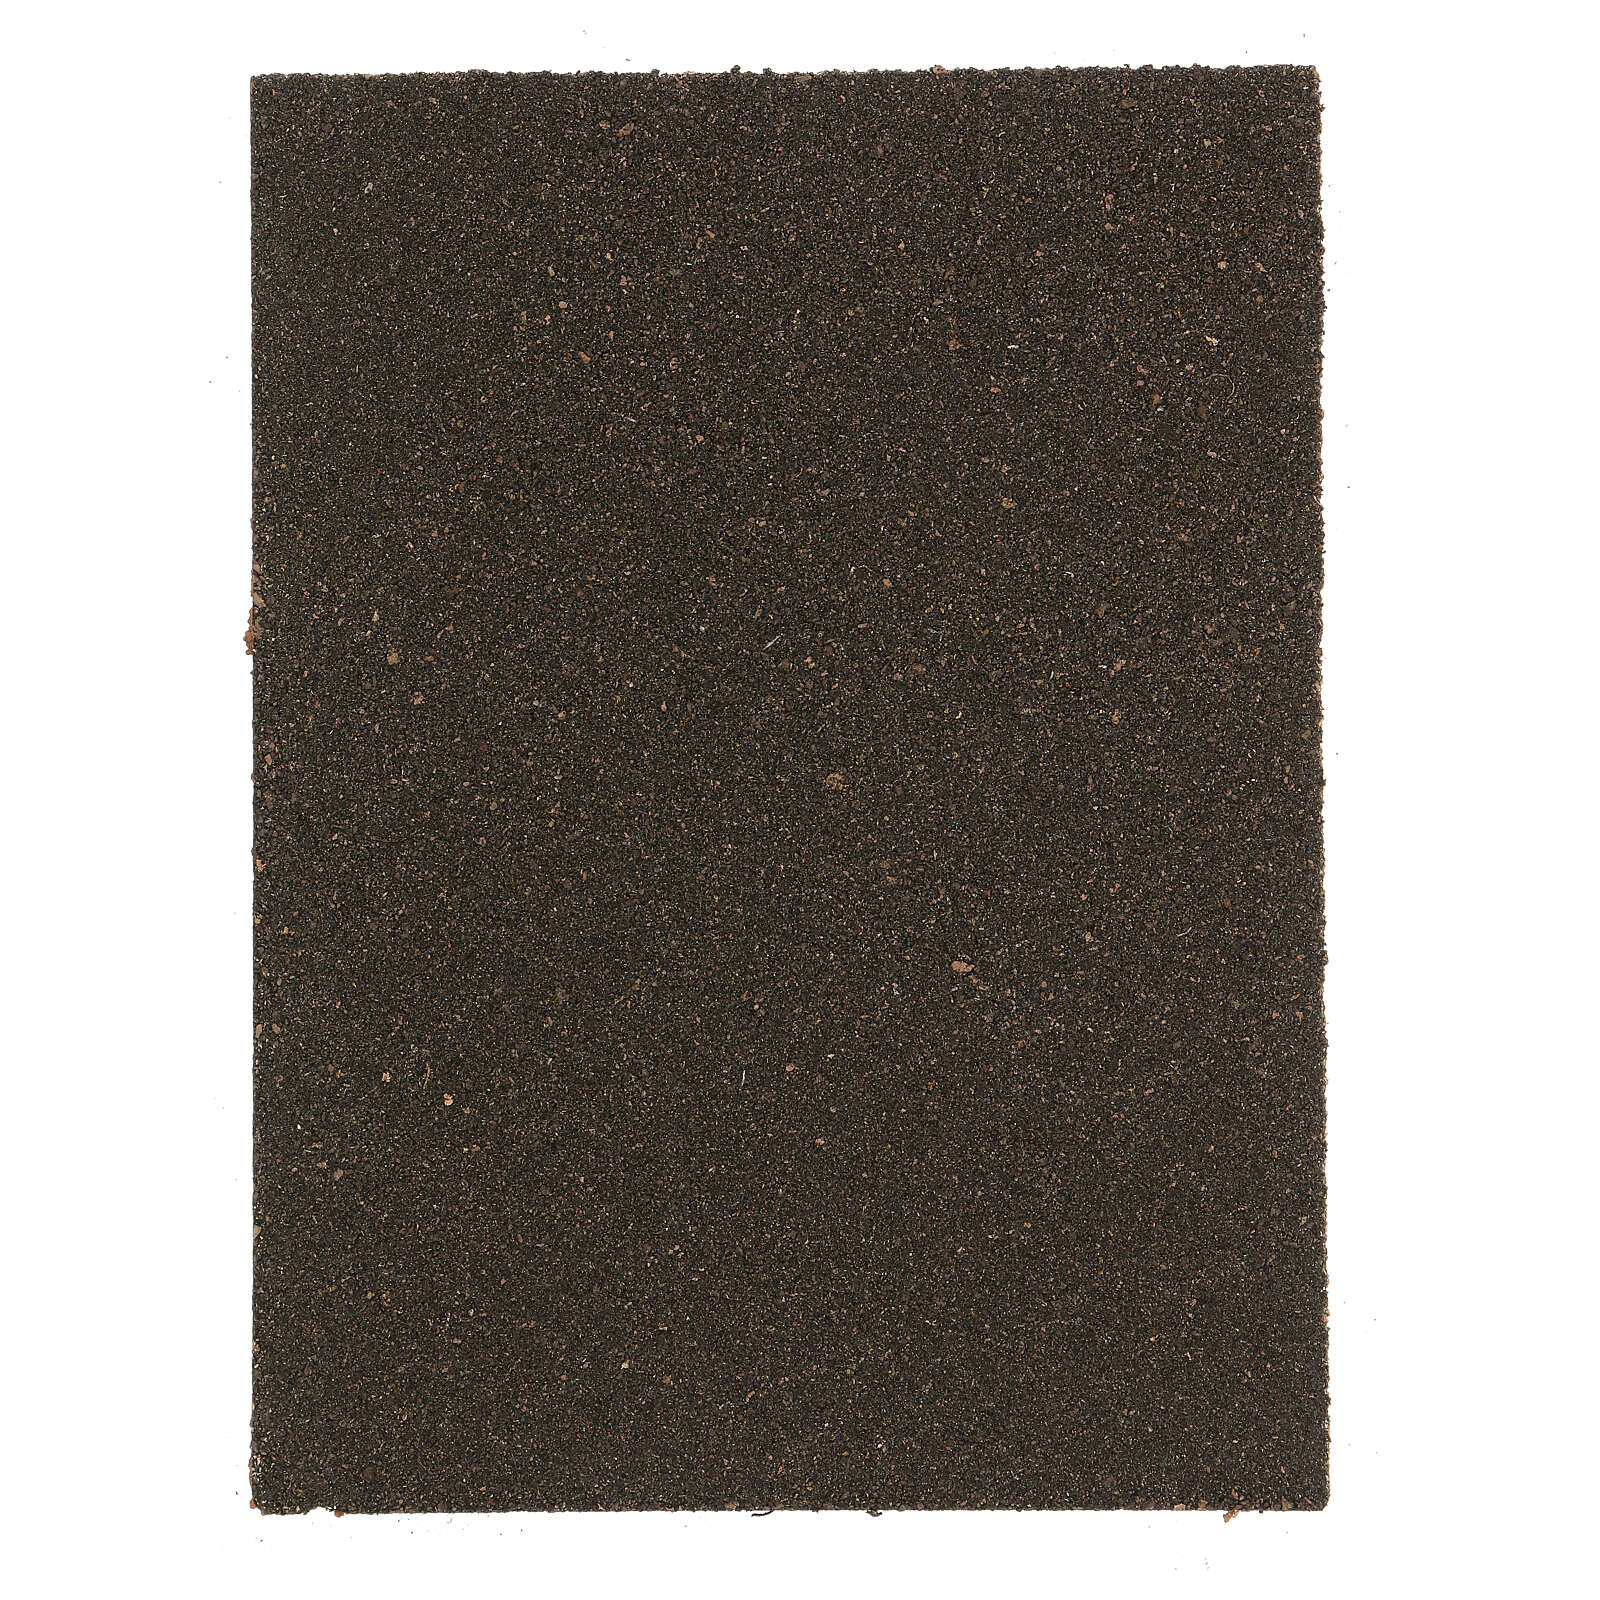 Panel corcho belén ladrillos espida de pez 35x25x1 cm 4